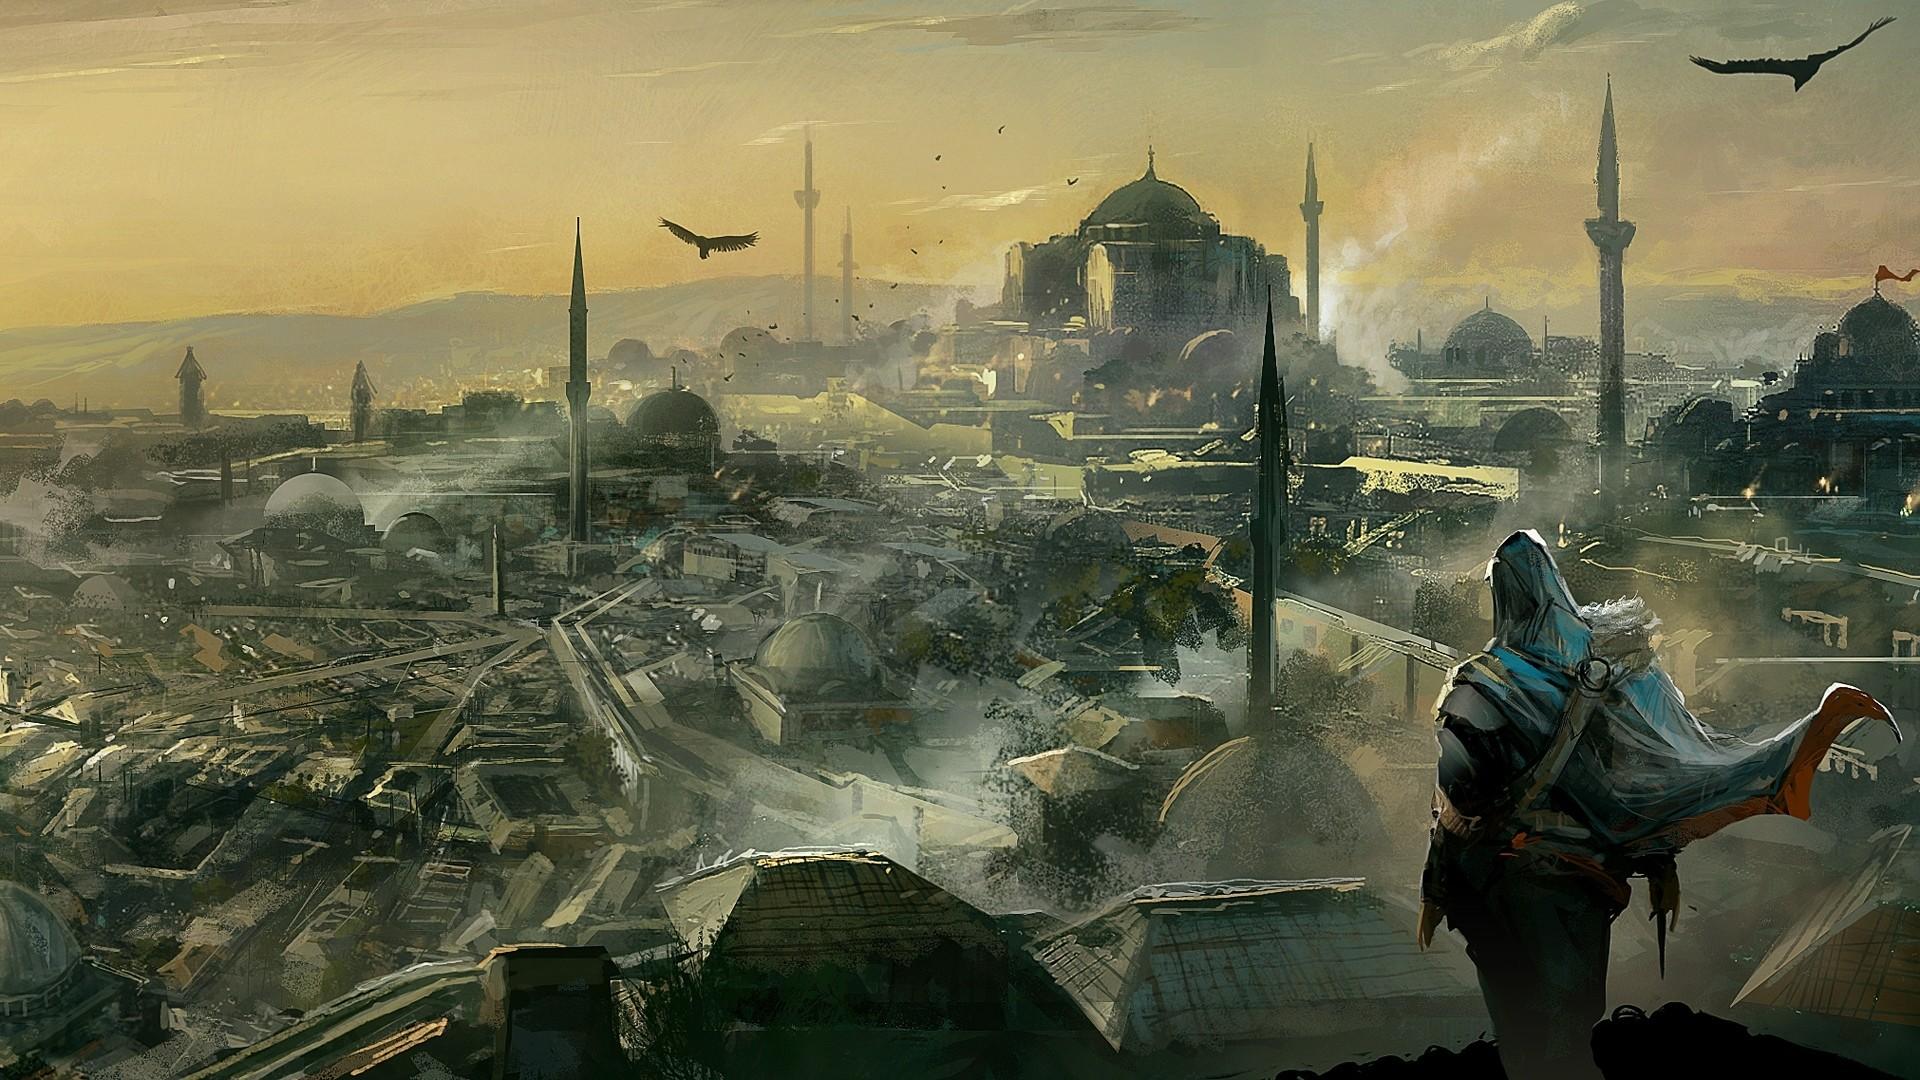 Wallpaper assassins creed, desmond miles, fan art, birds, city,  sky